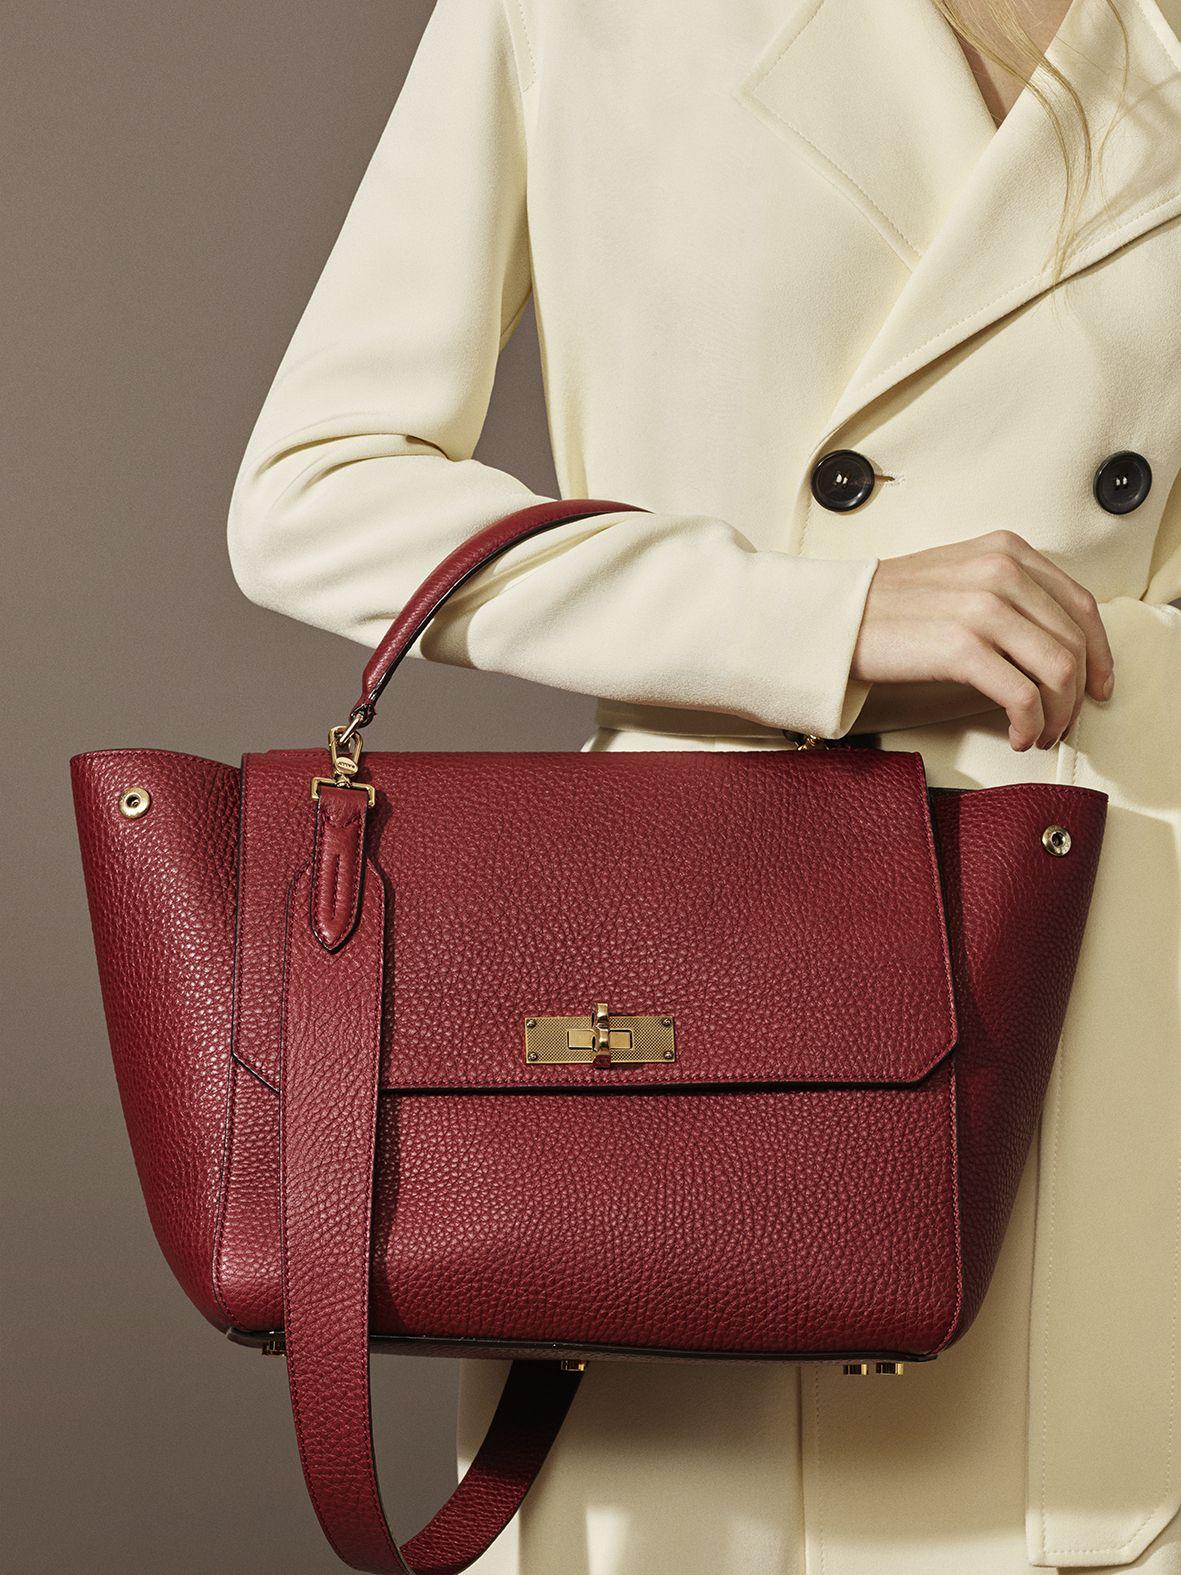 Bally Handle Bag - B Turn   Leather Handbags-Everhandmade.com   Bags ... 2a3d4284d6